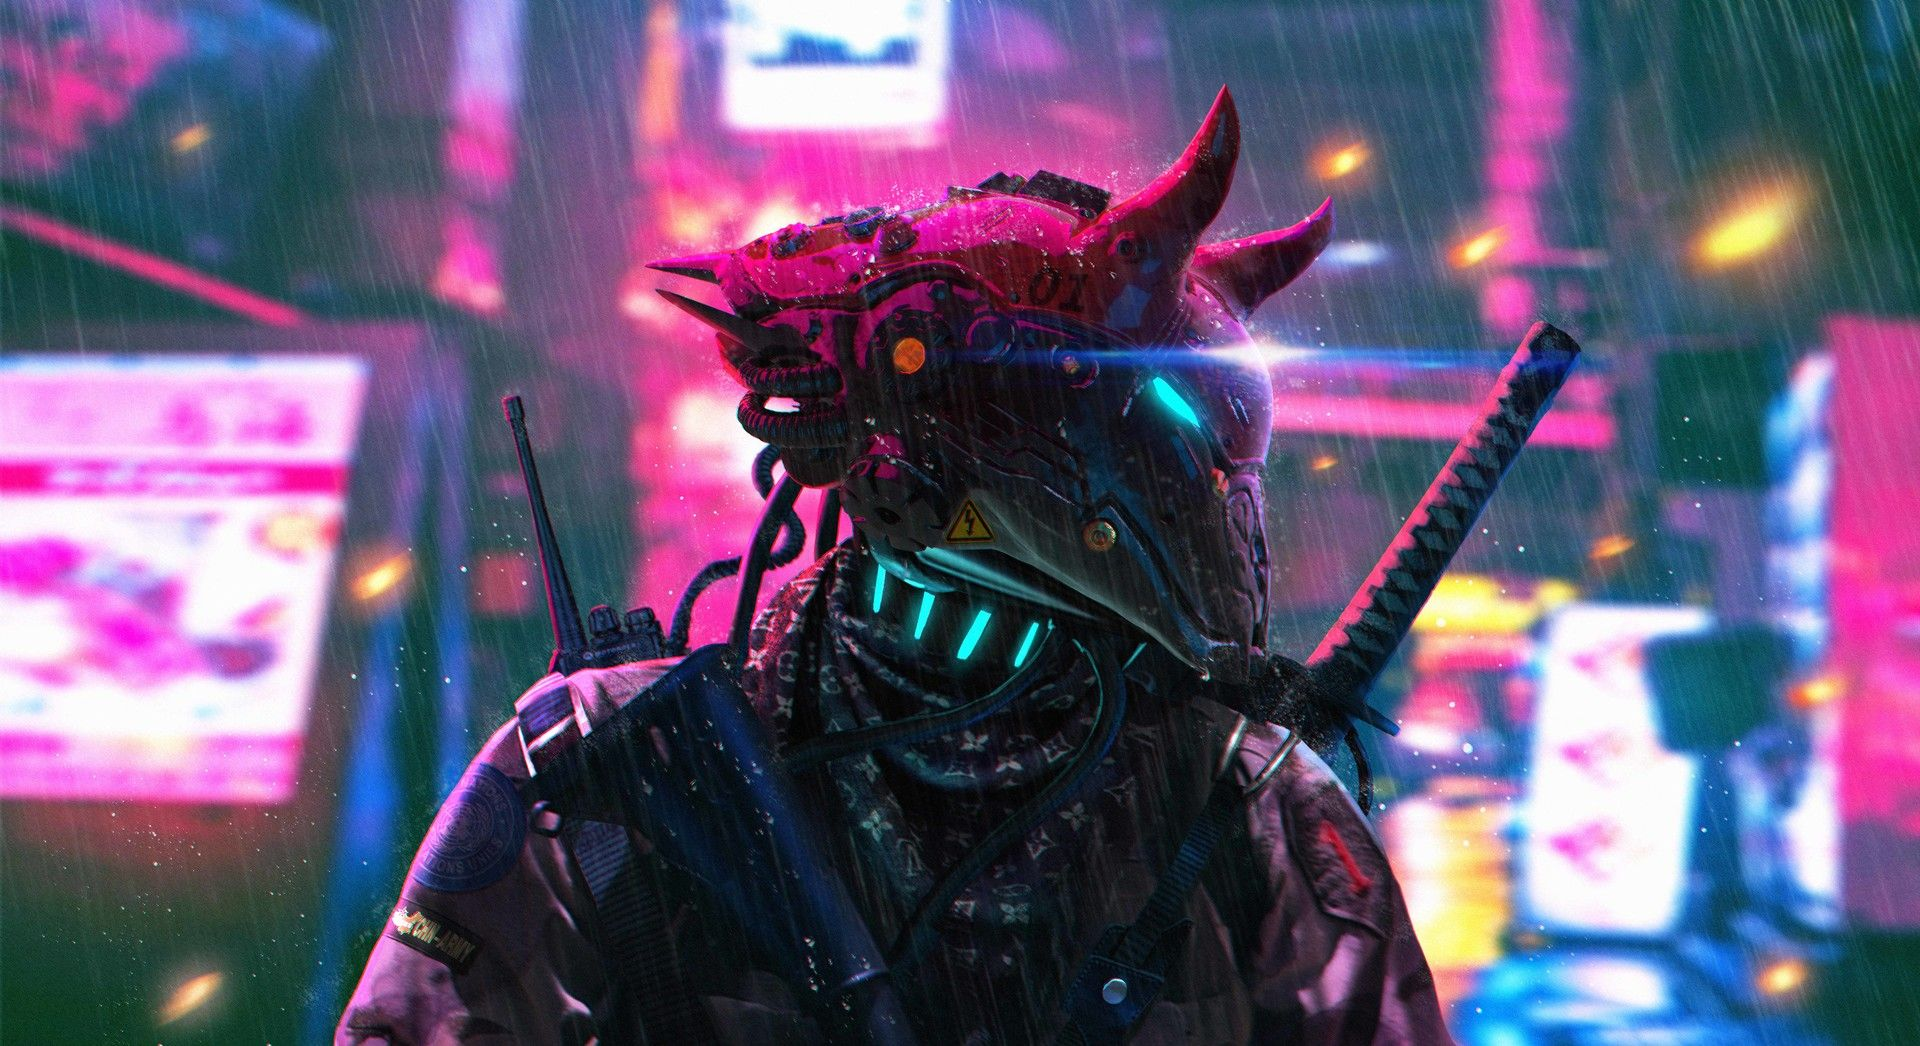 ArtStation Z警,1号, Yang Tuo Cyberpunk aesthetic